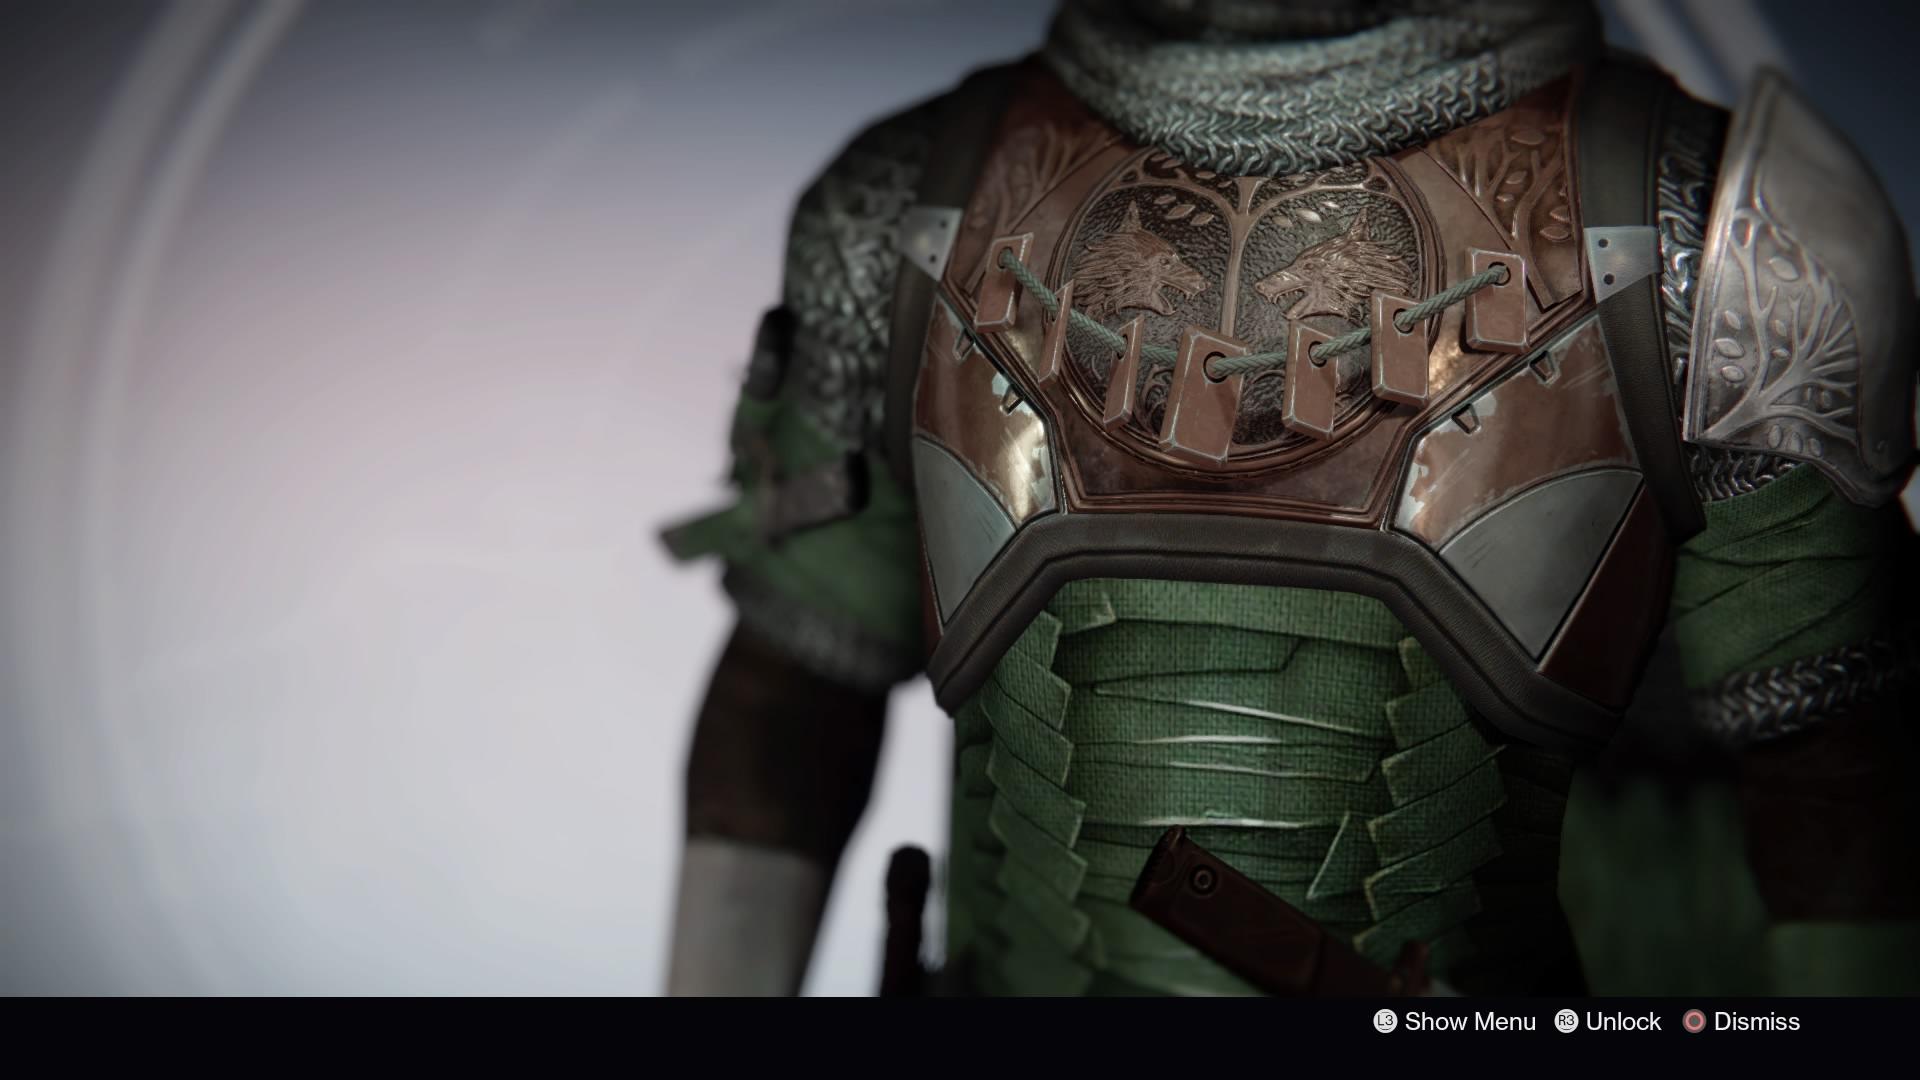 iron companion vest